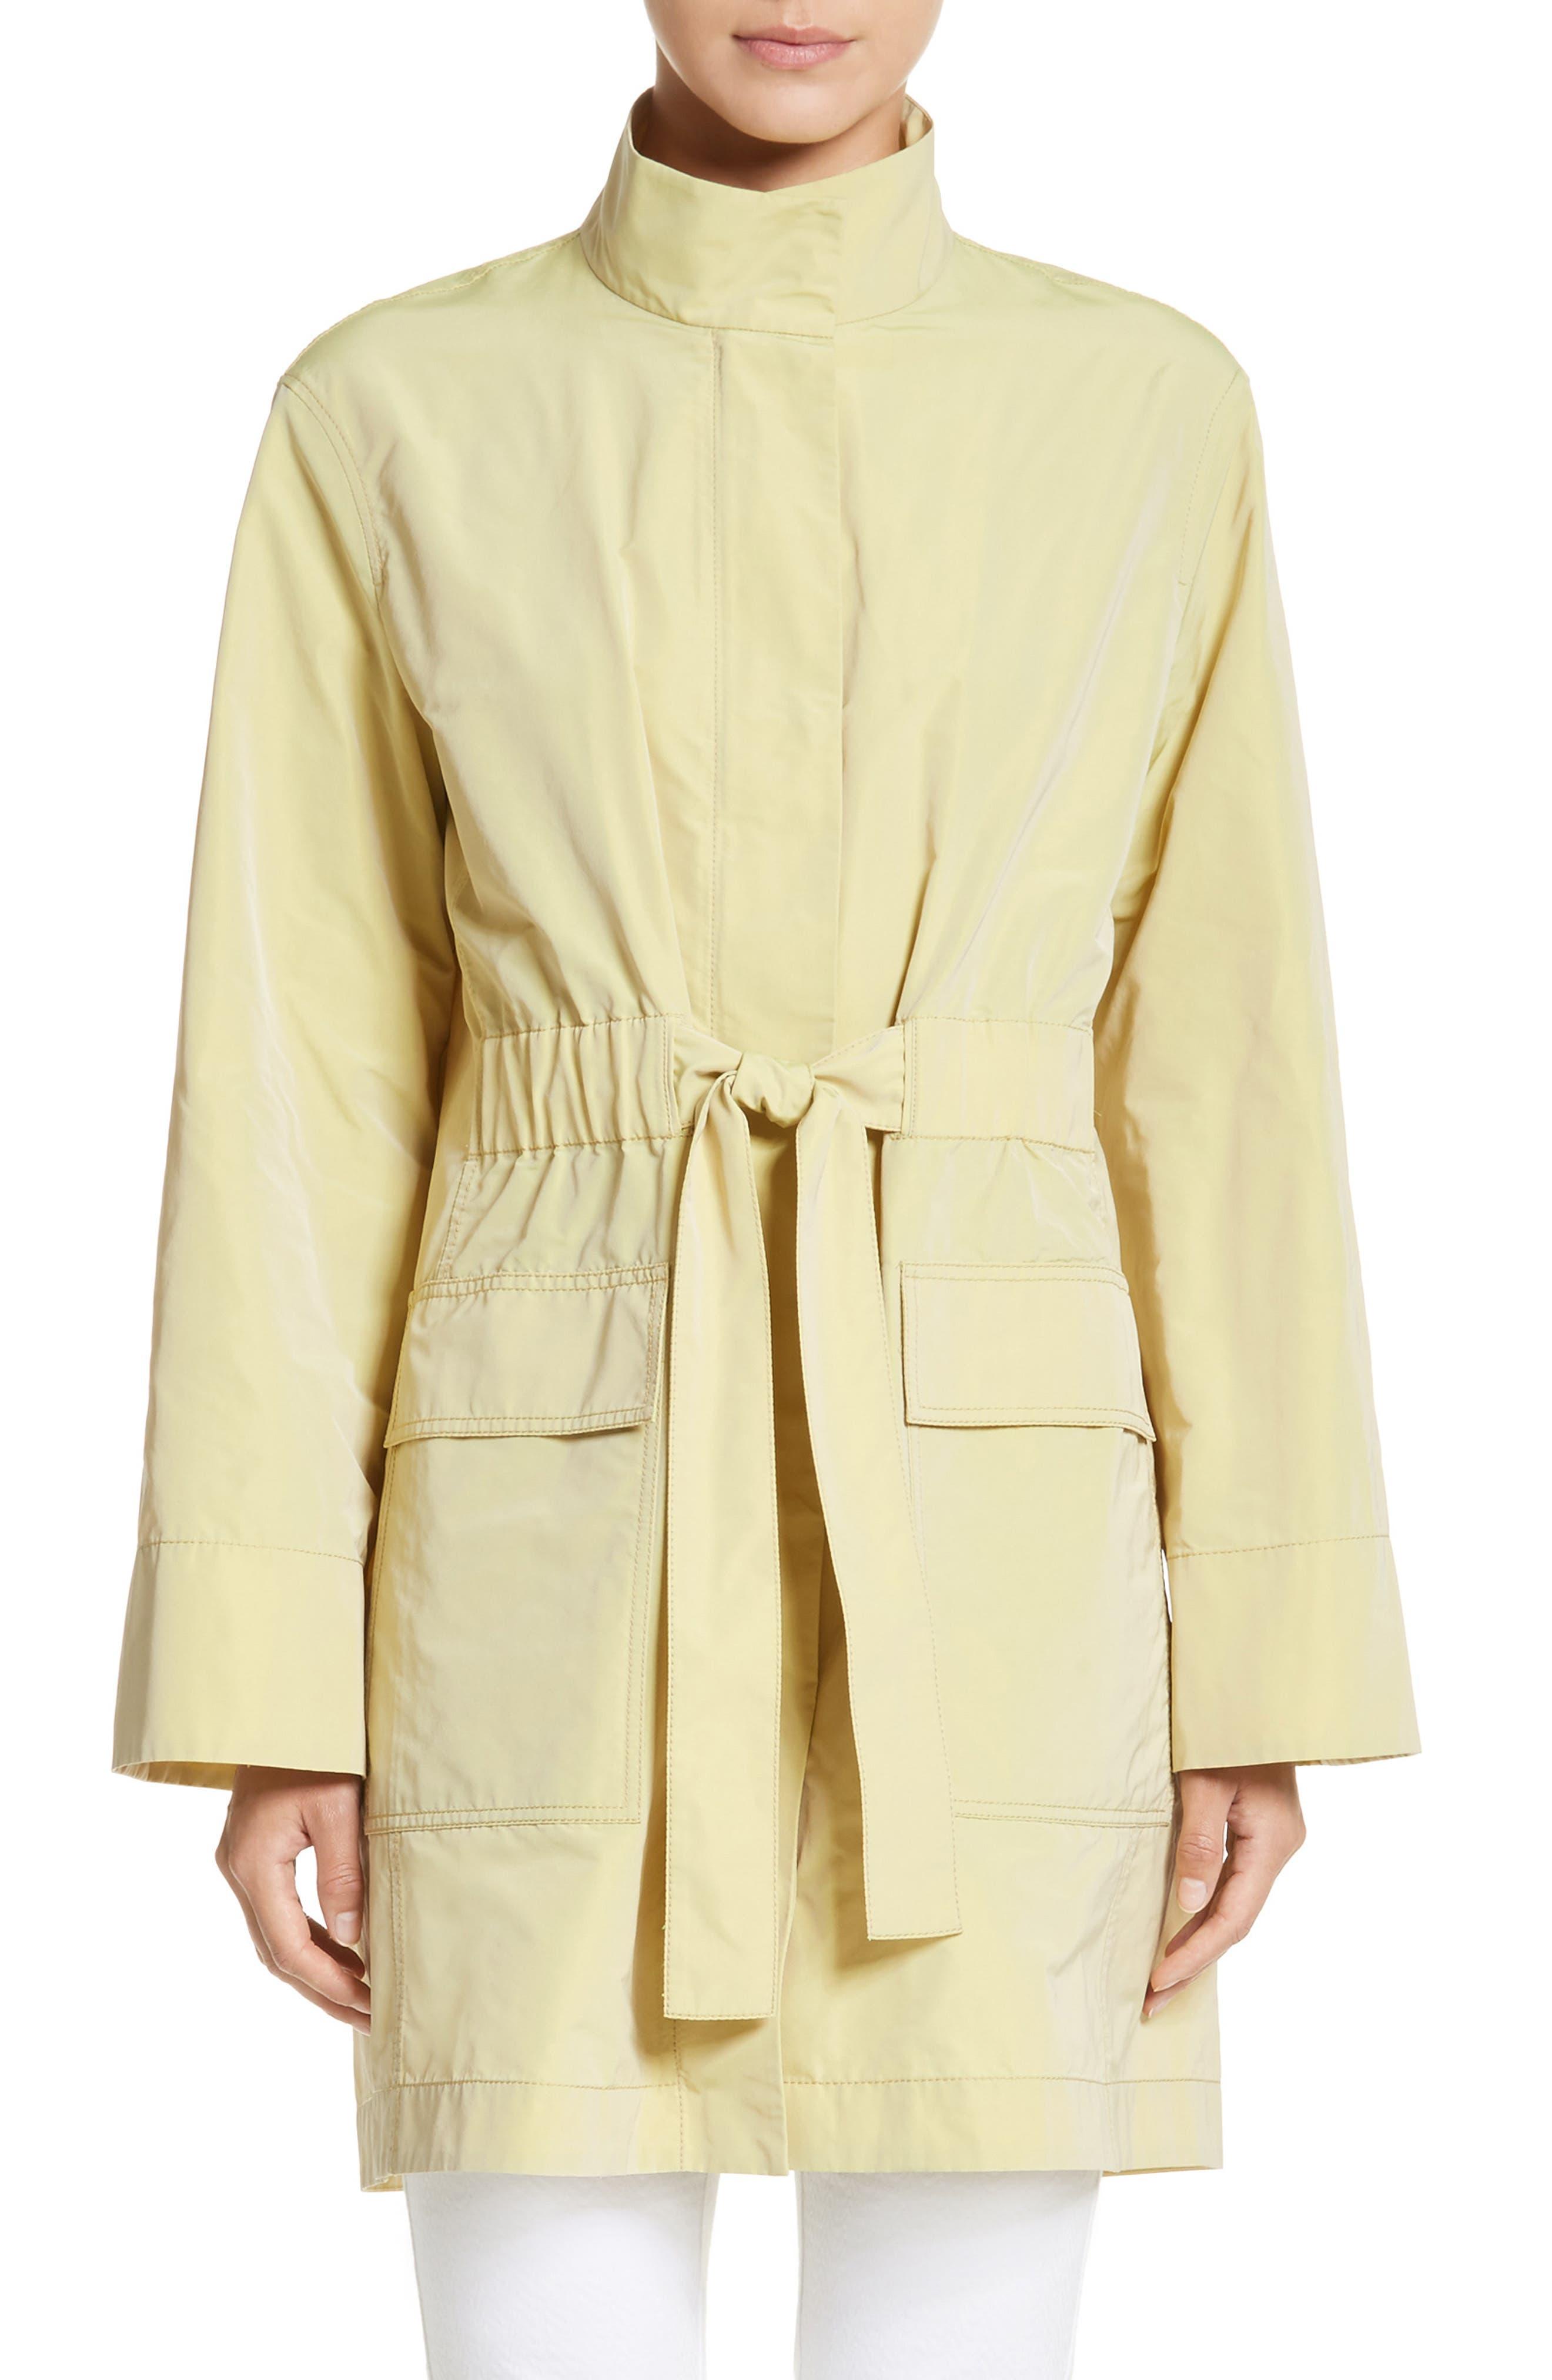 Lafayette 148 New York Penny Tie Front Jacket